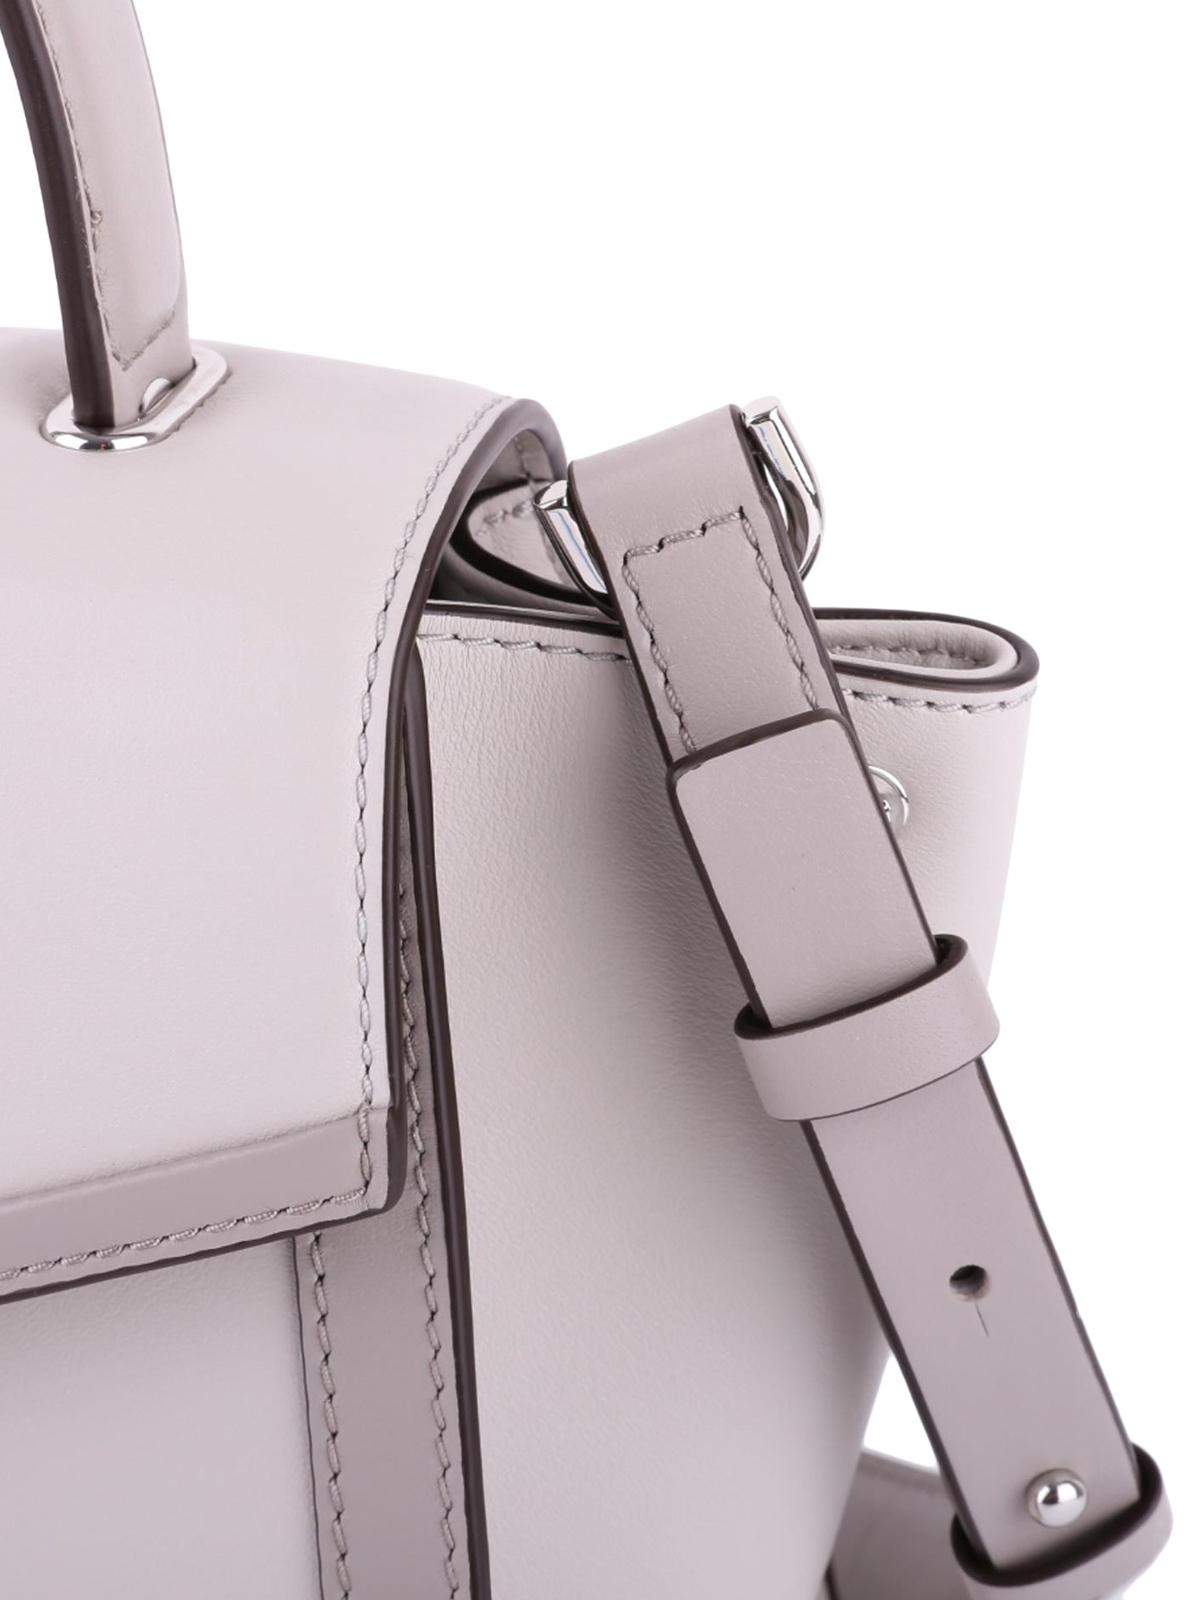 Michael Kors Whitney large leather satchel shoulder bags